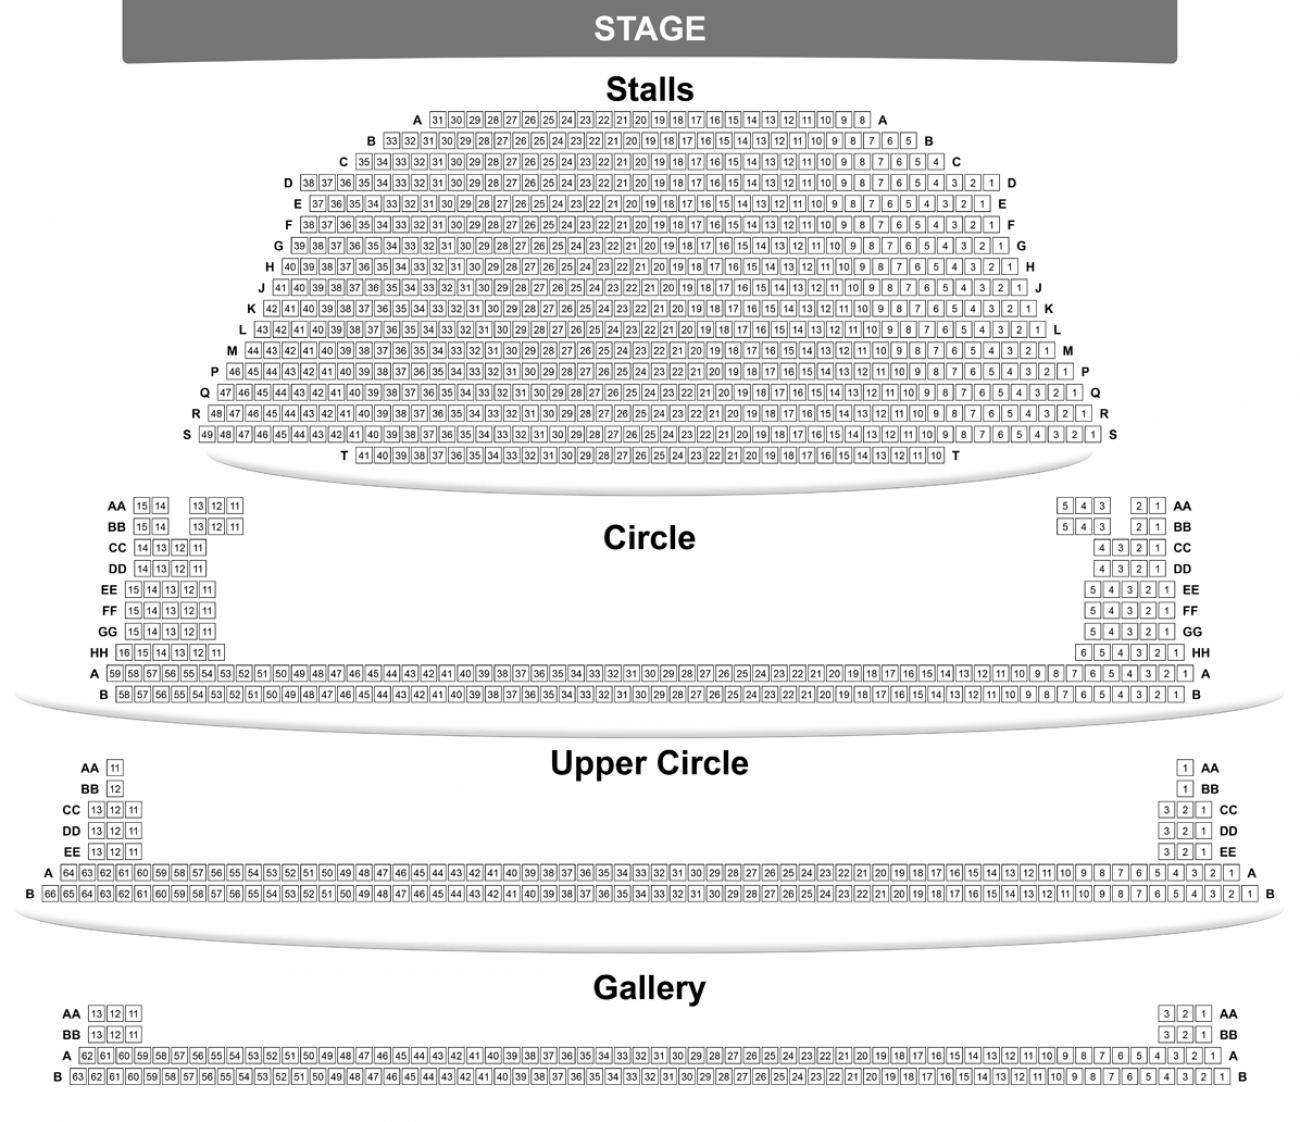 Barbican Theatre Seating plan